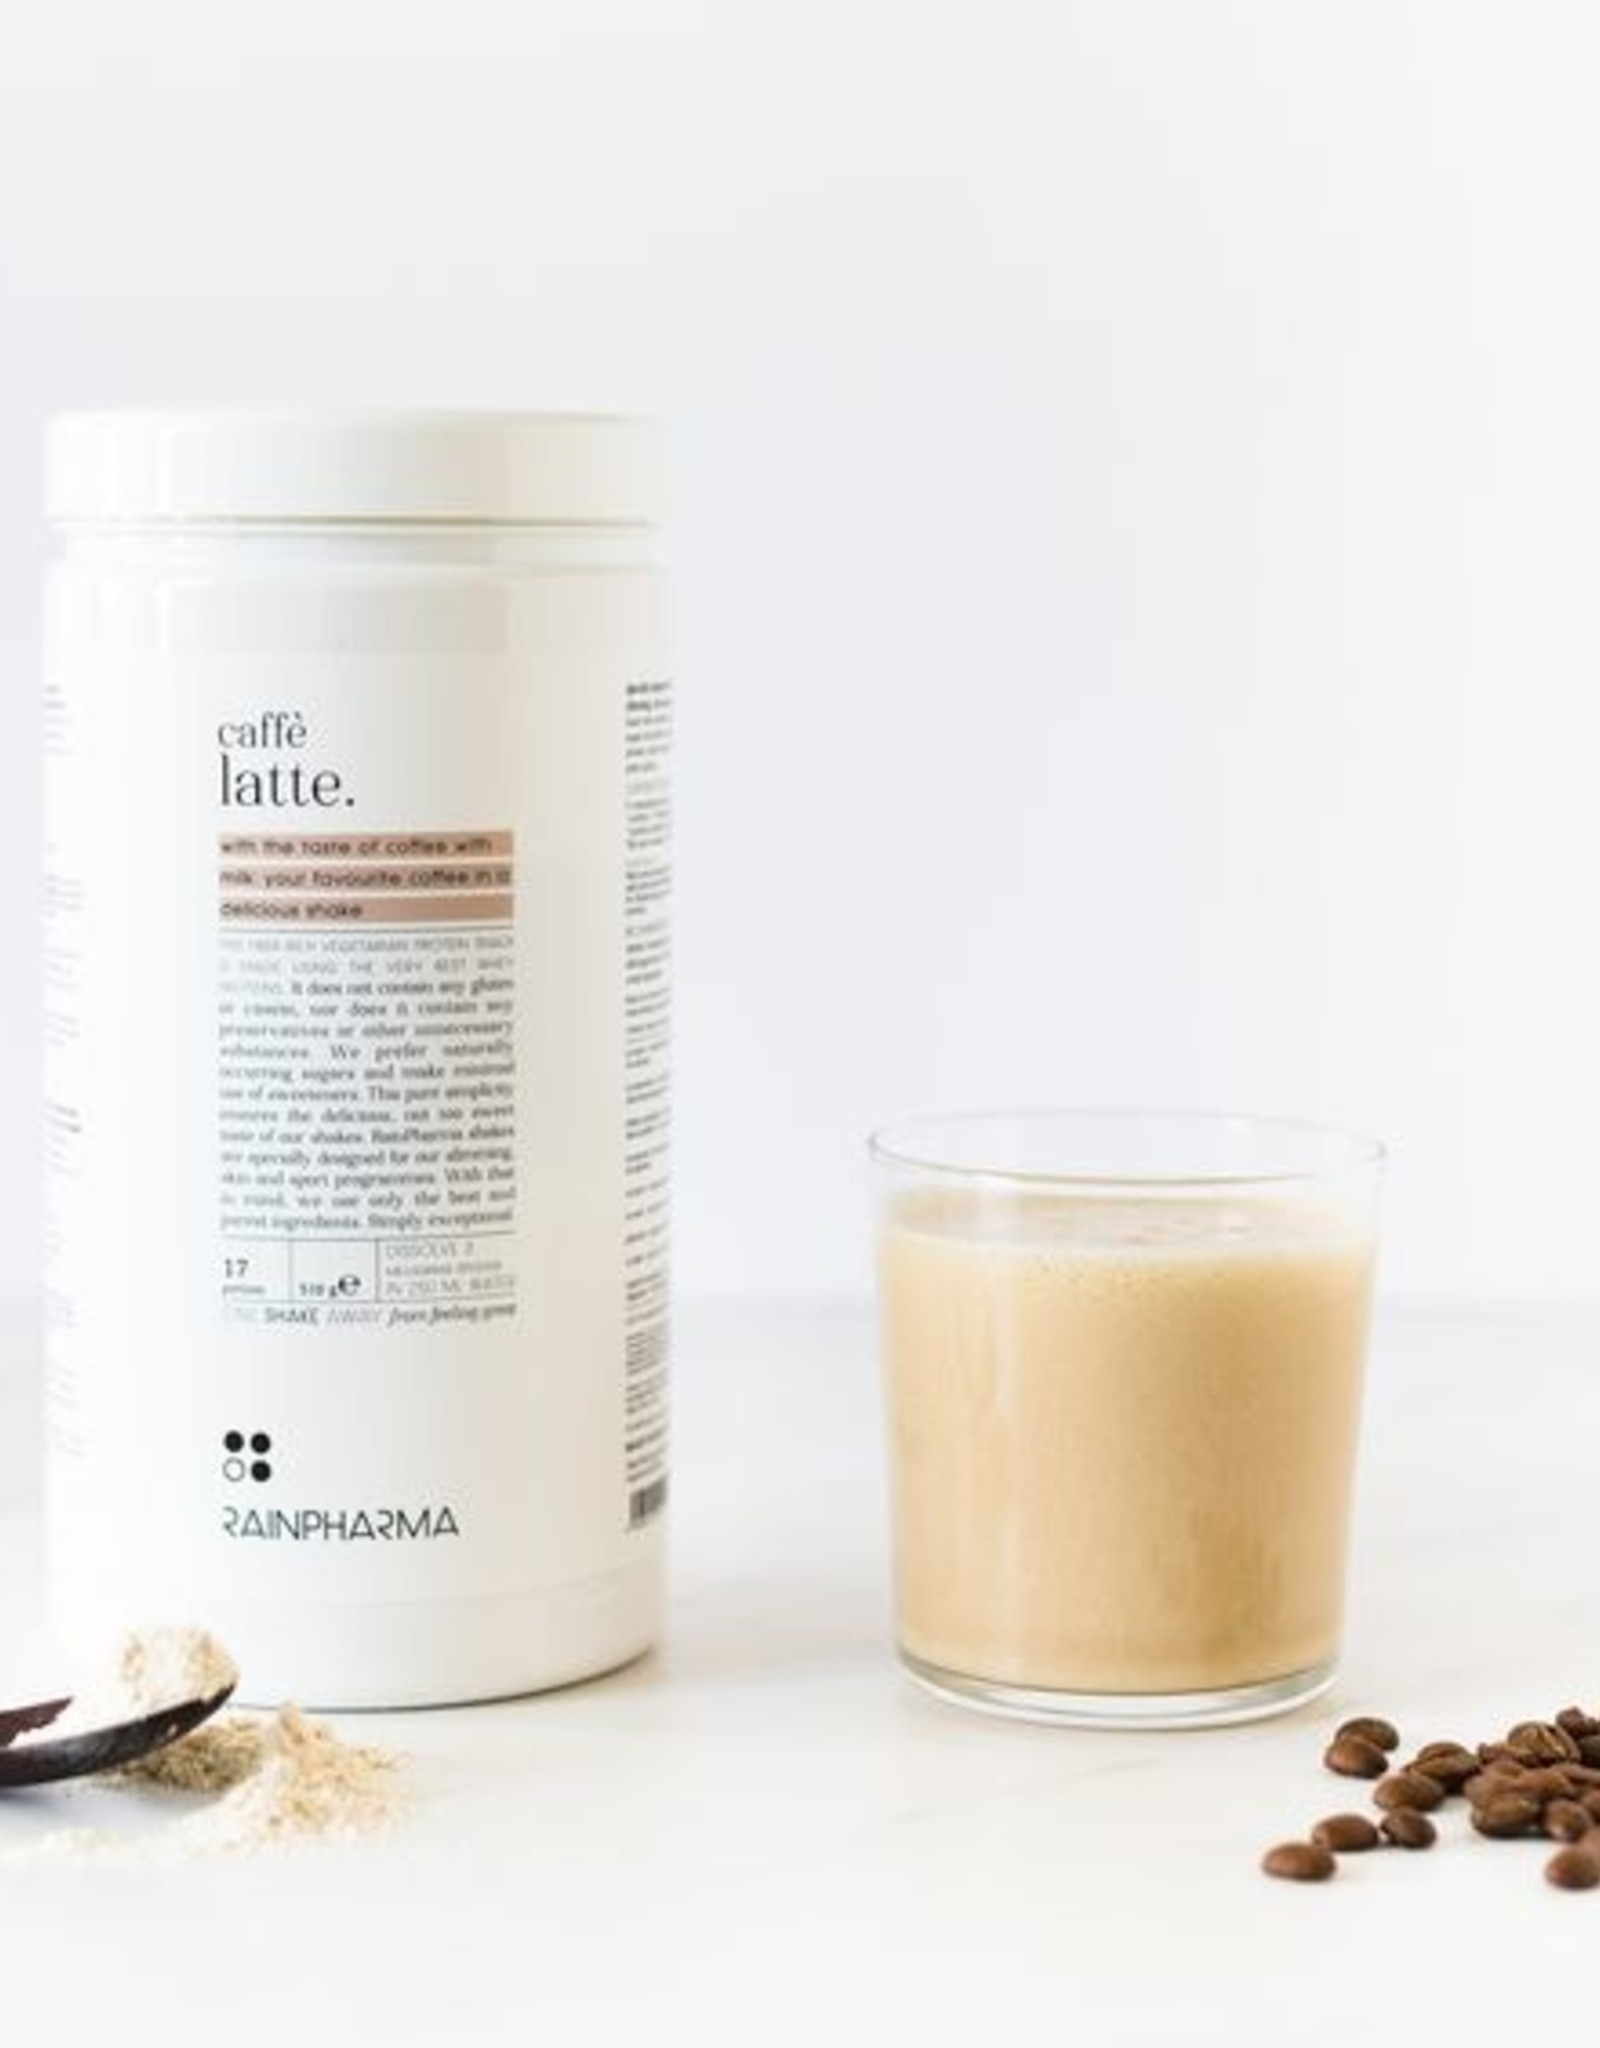 RainPharma Caffe Latte 510g - Rainpharma